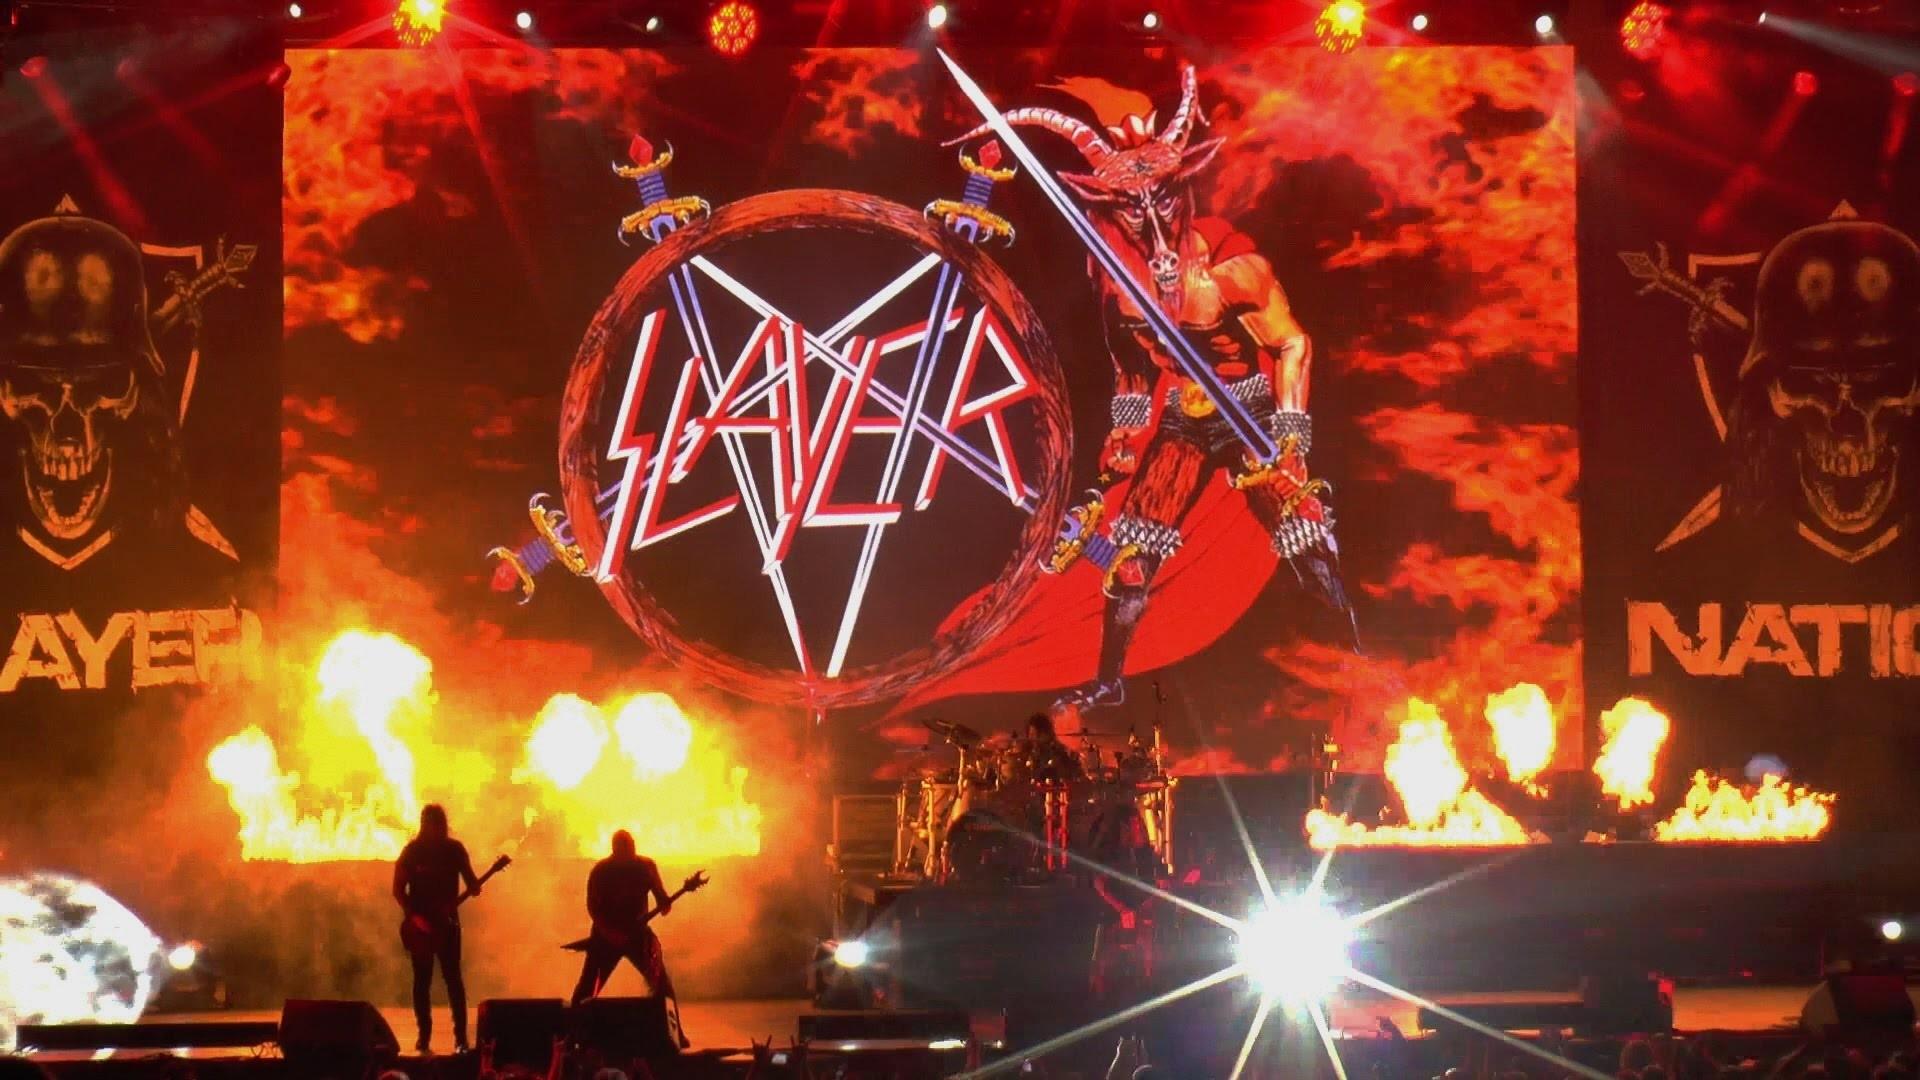 Slayer – Hell Awaits / South of Heaven, Chula Vista, CA 6-26-15 – YouTube